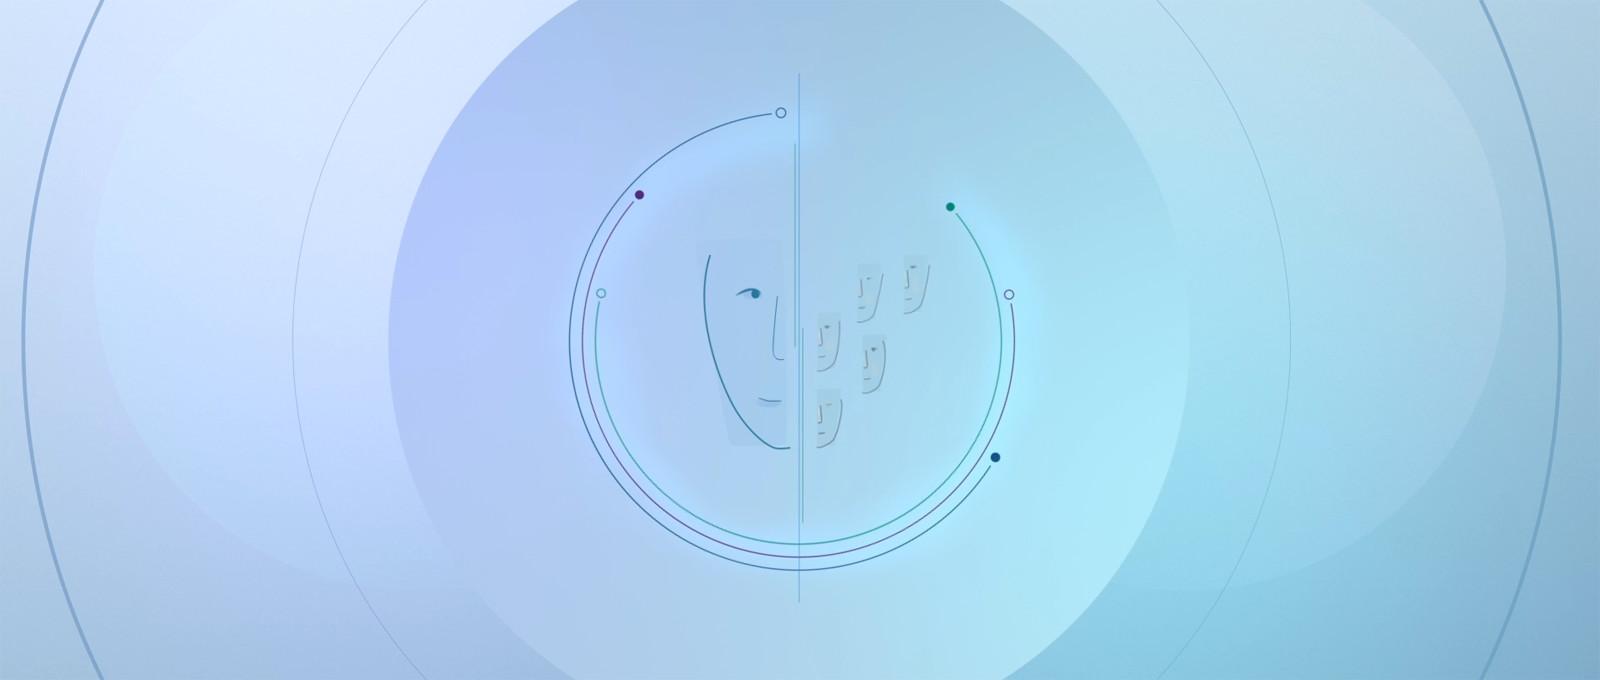 myAR Design Frame 04